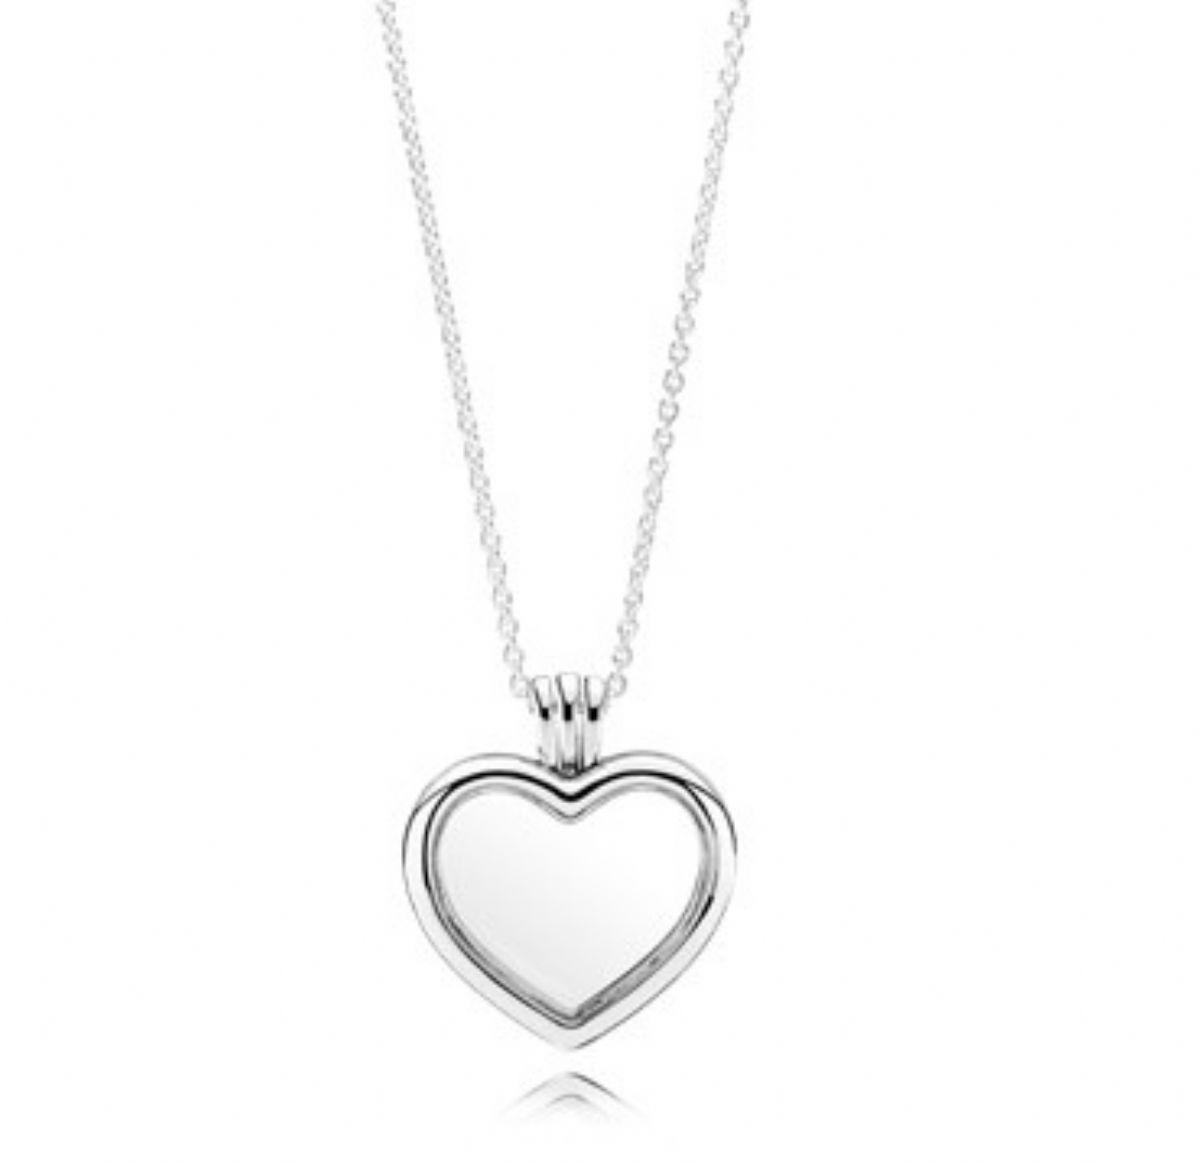 ... Stříbrný náhrdelník Pandora s medailonem - Srdce 1 4 ... 25ab48d6c14